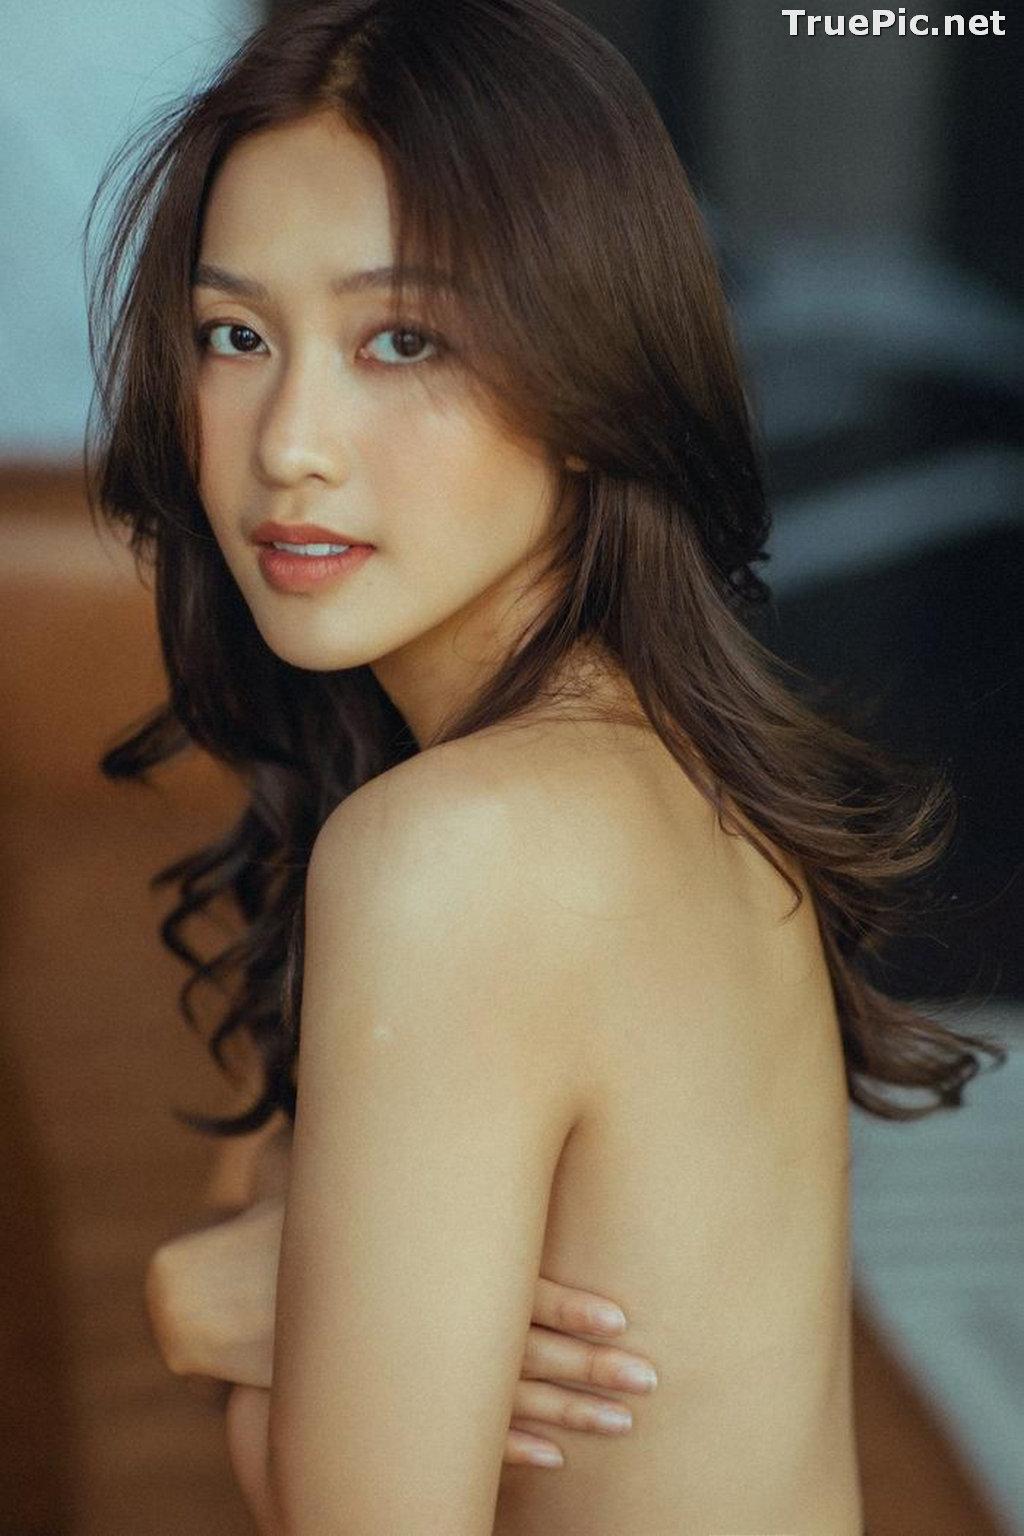 Image Vietnamese Hot Girl - Kha Ngan - Gentle Young Charming - TruePic.net - Picture-7